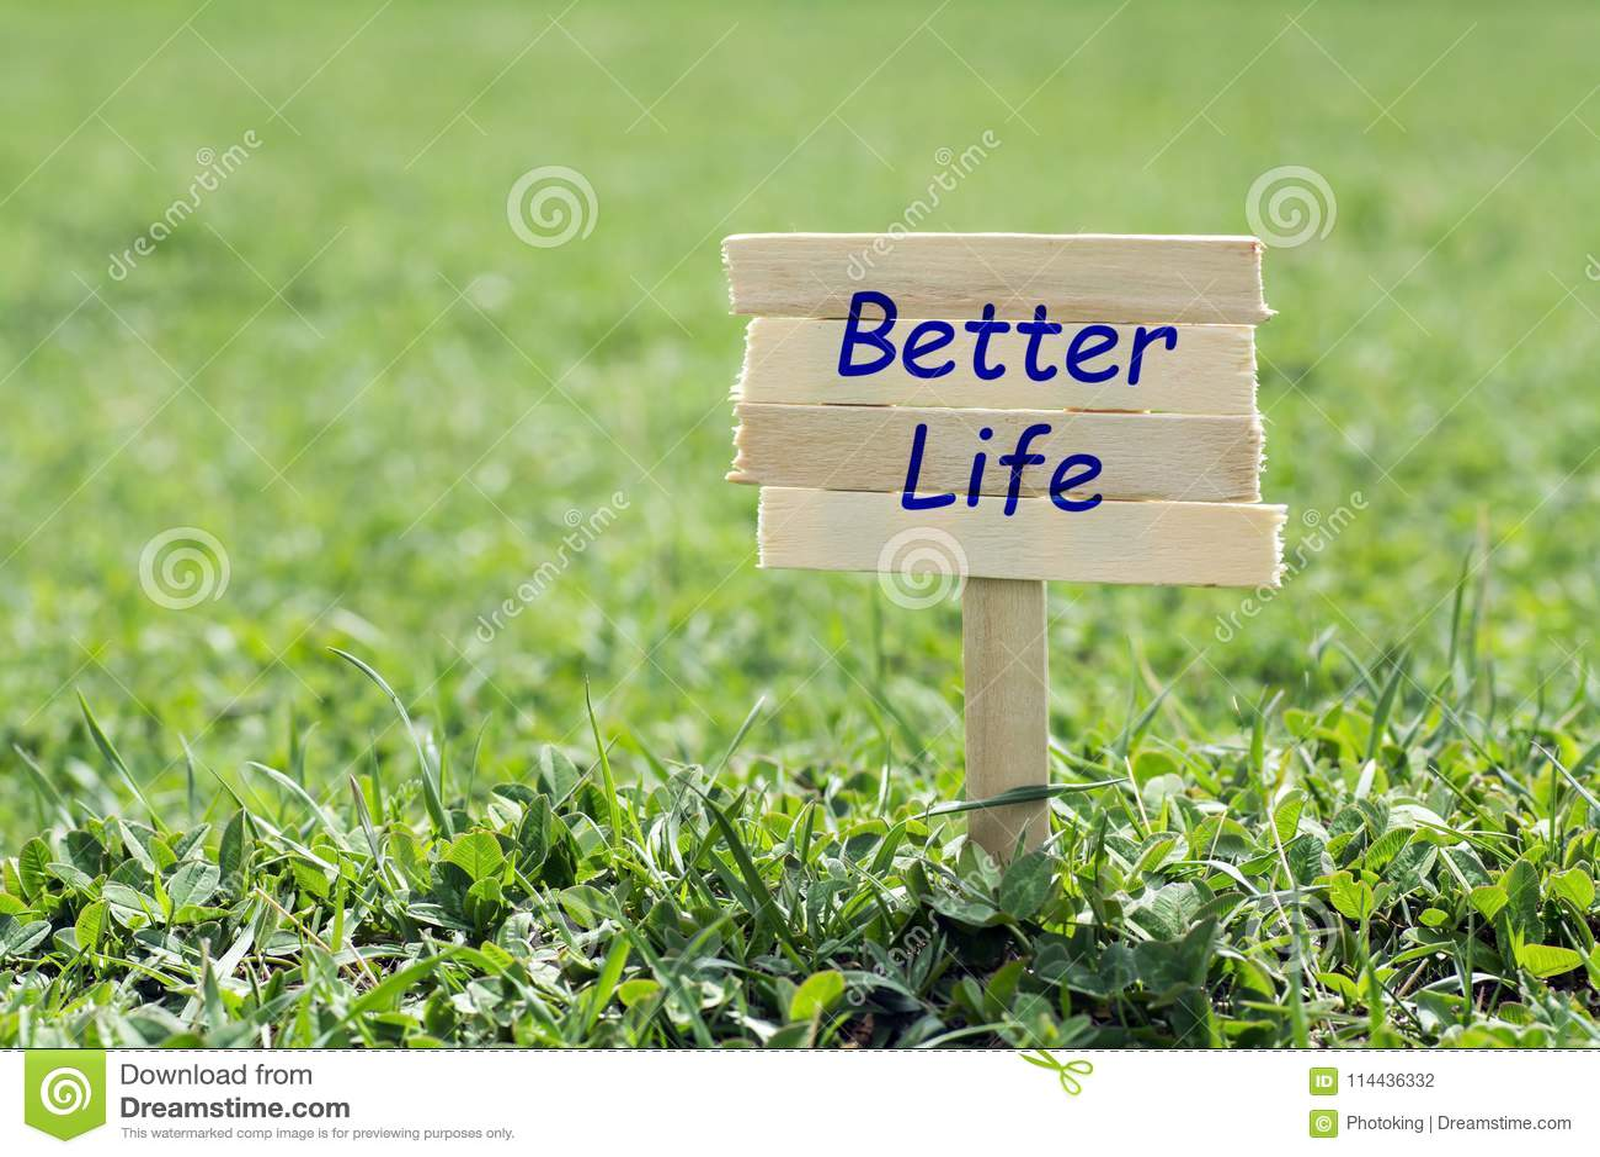 Better life sign